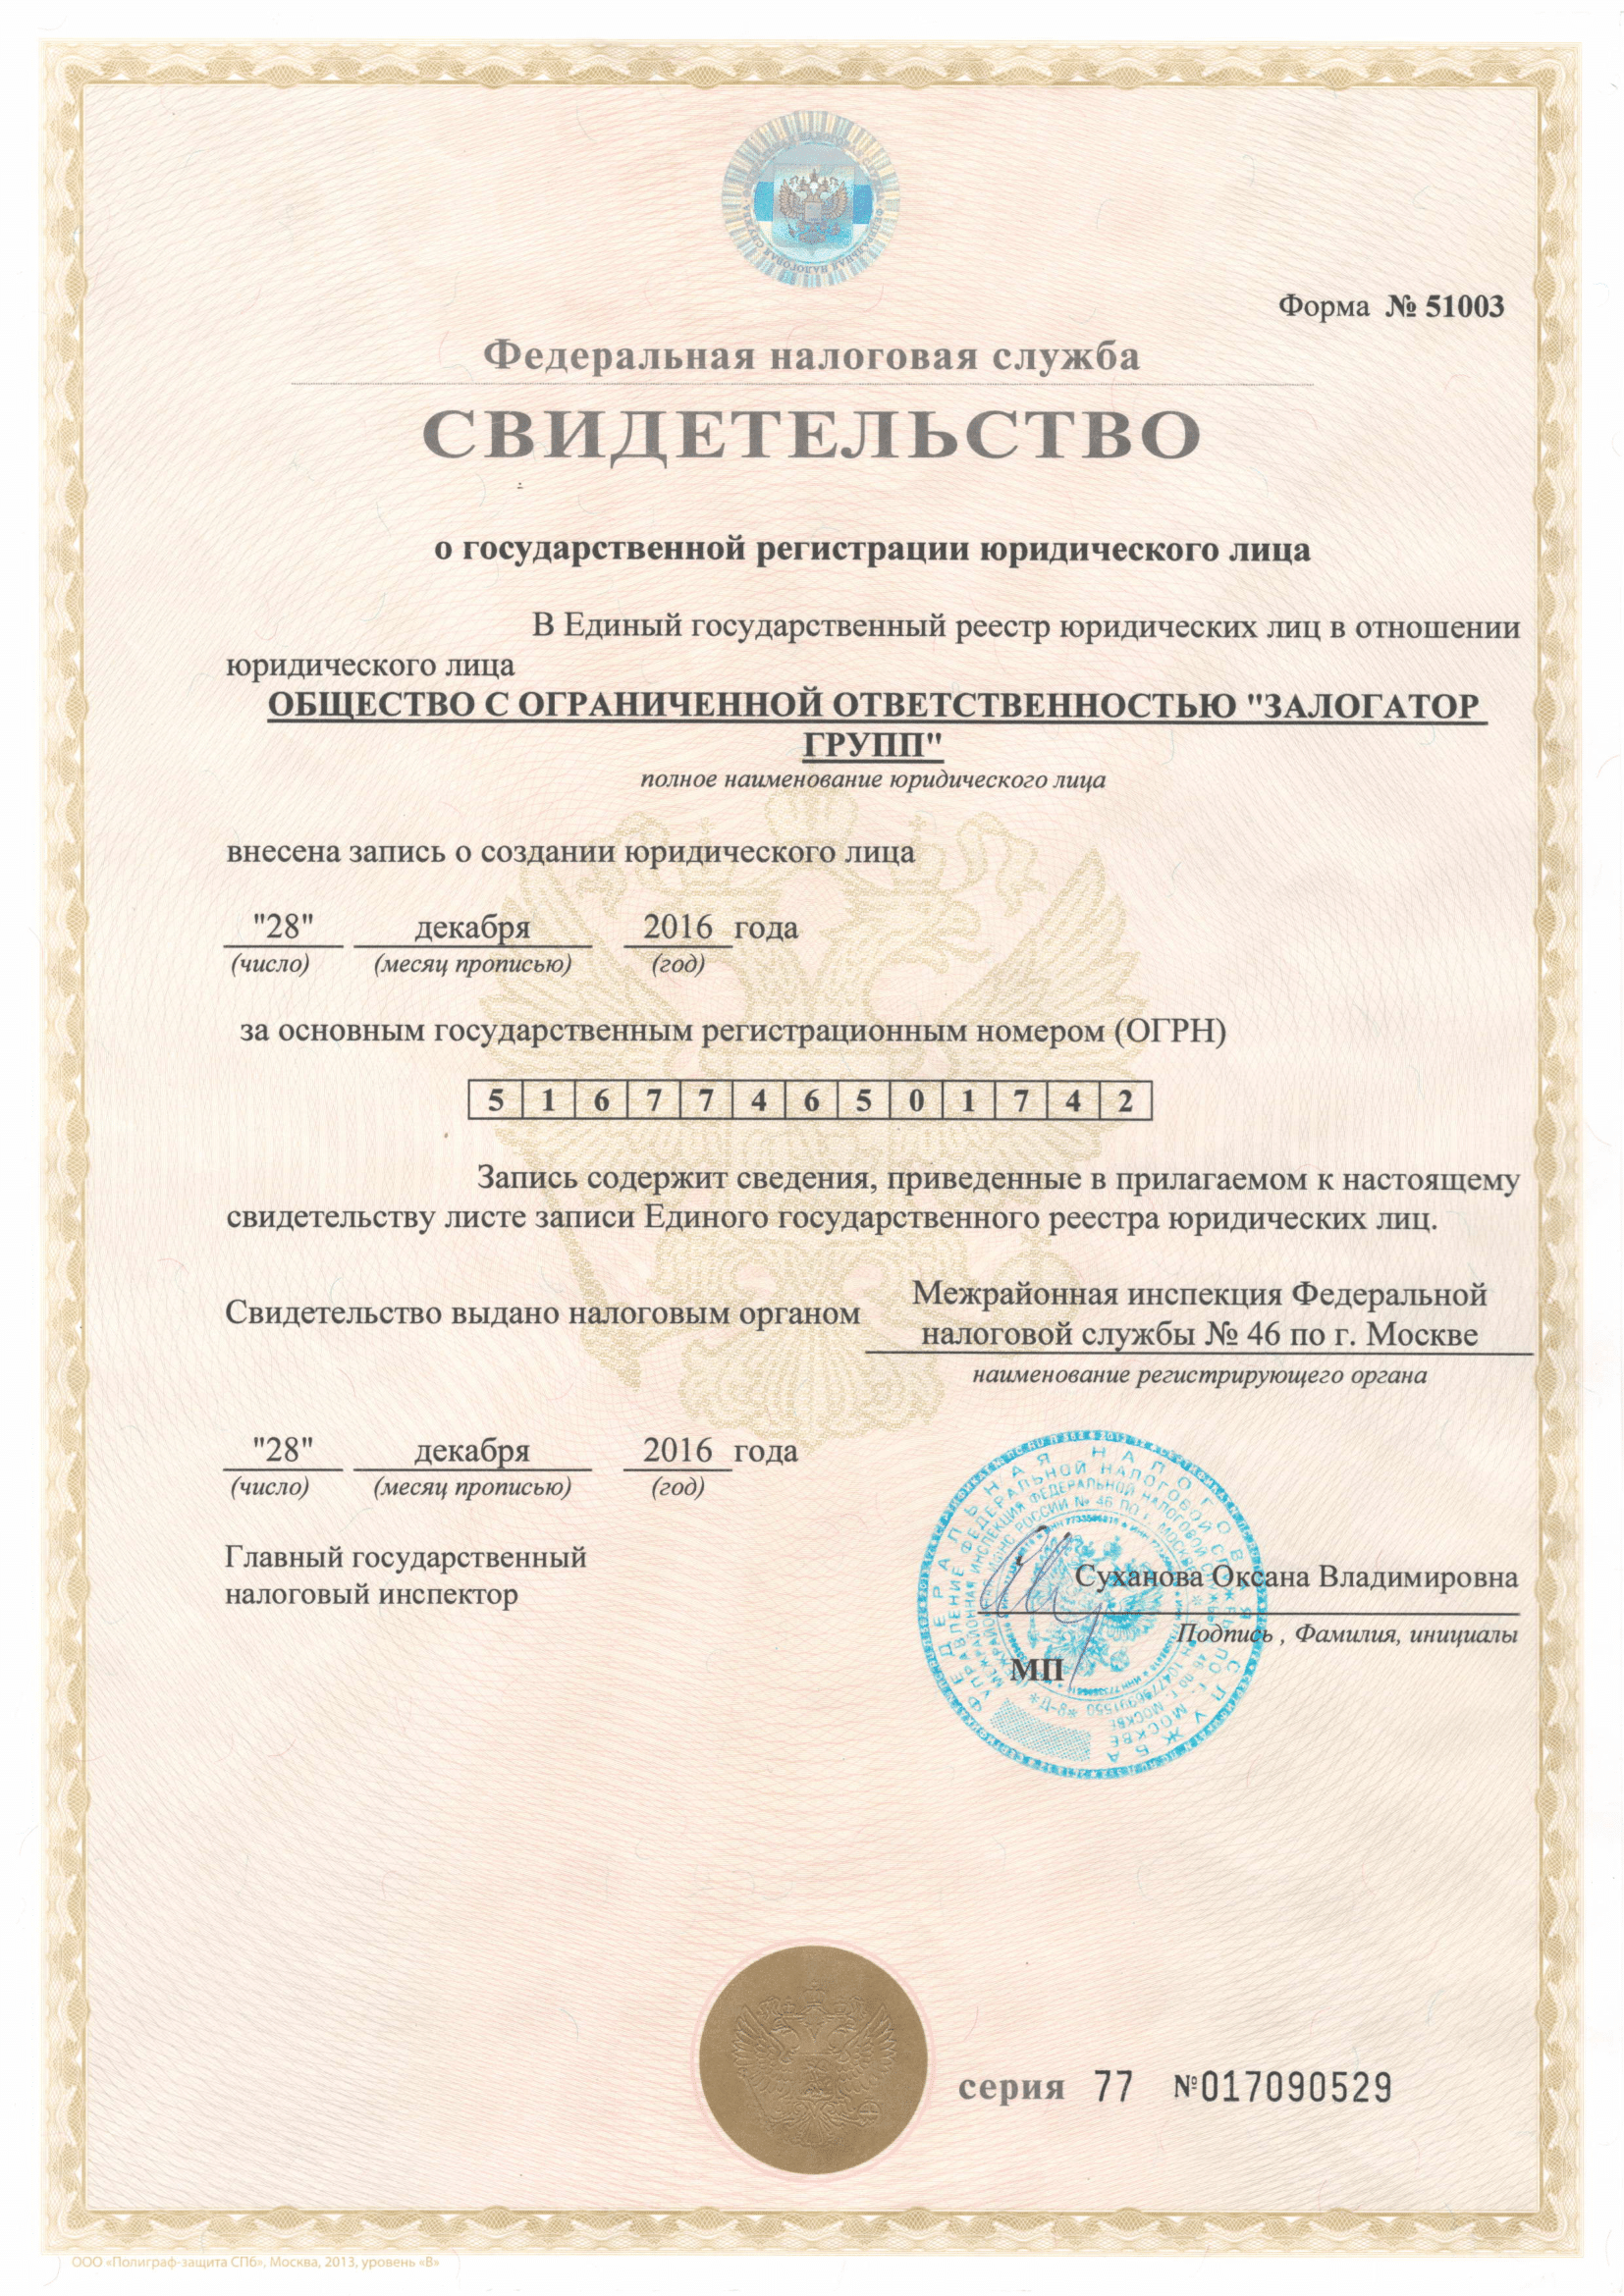 Деньги под залог недвижимости в Томске и Томской области